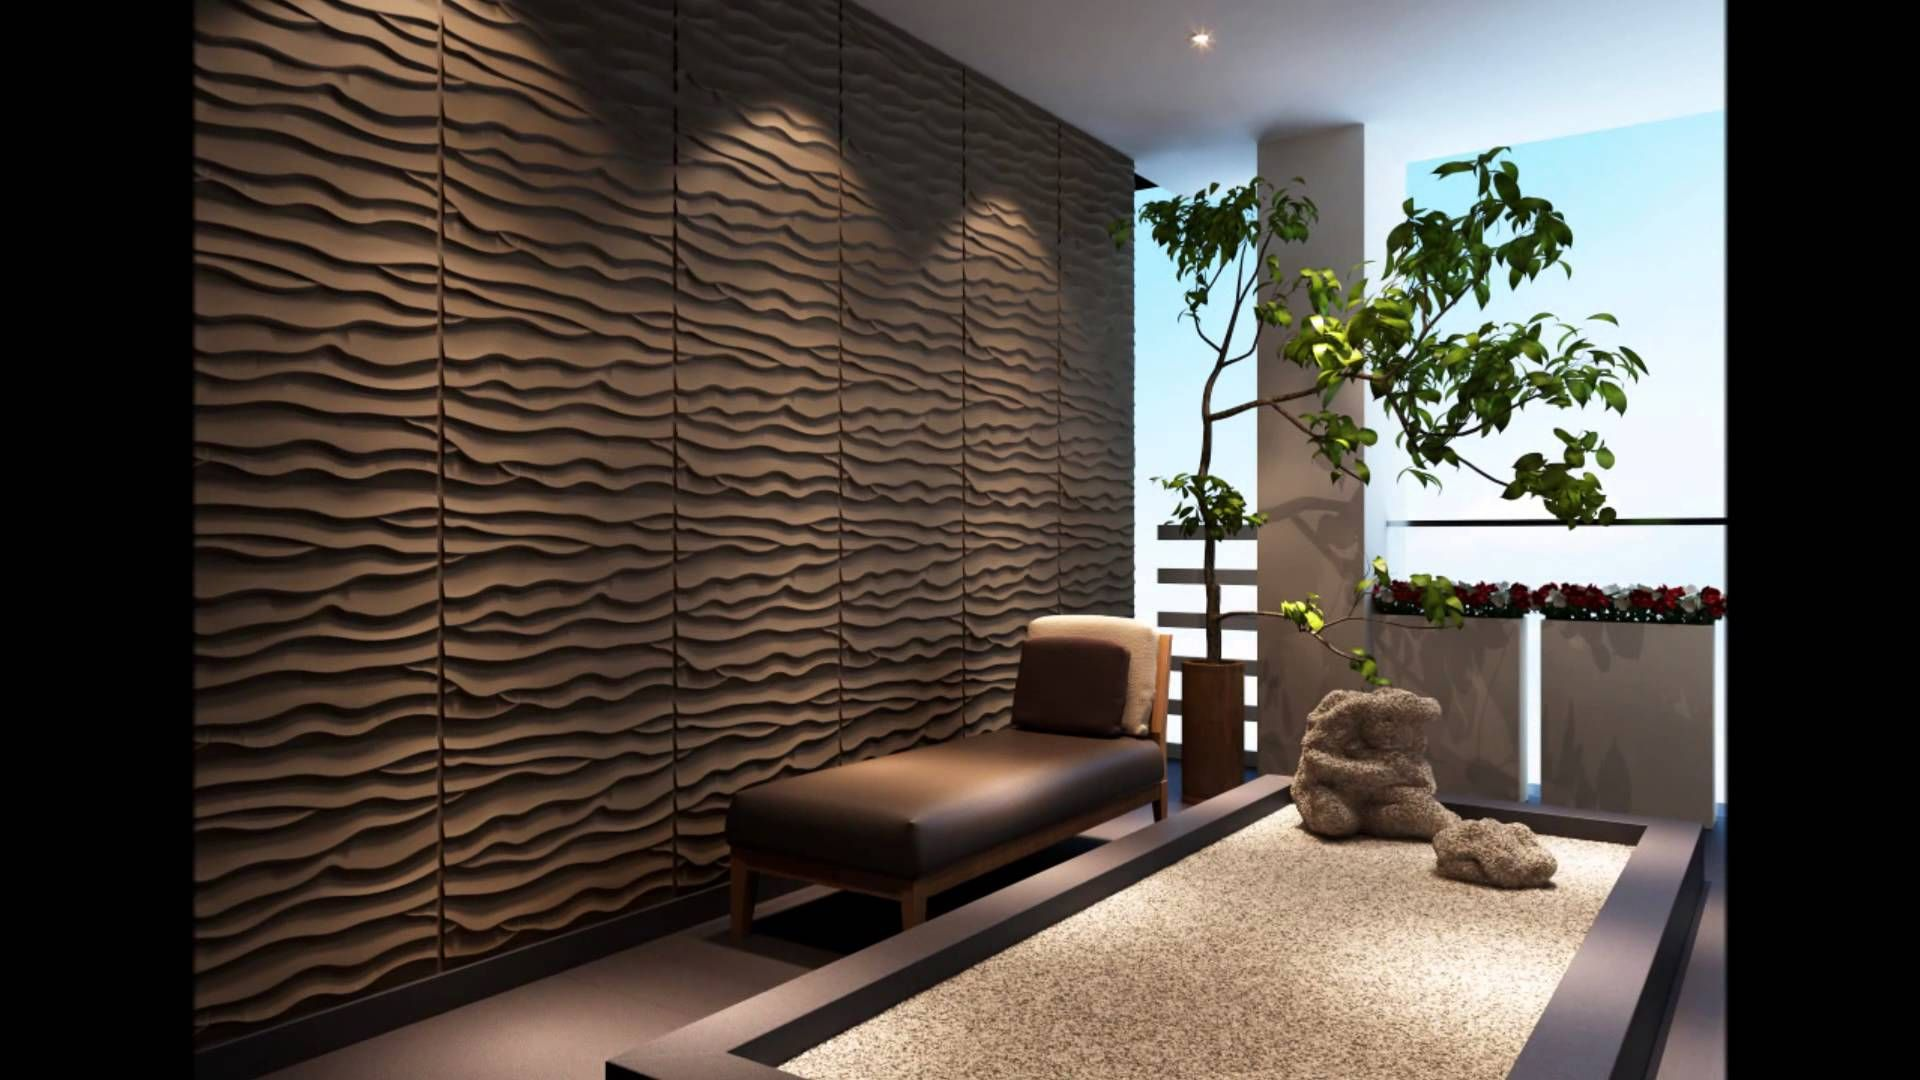 Triwol d interior decorative custom wall paneling design cnc